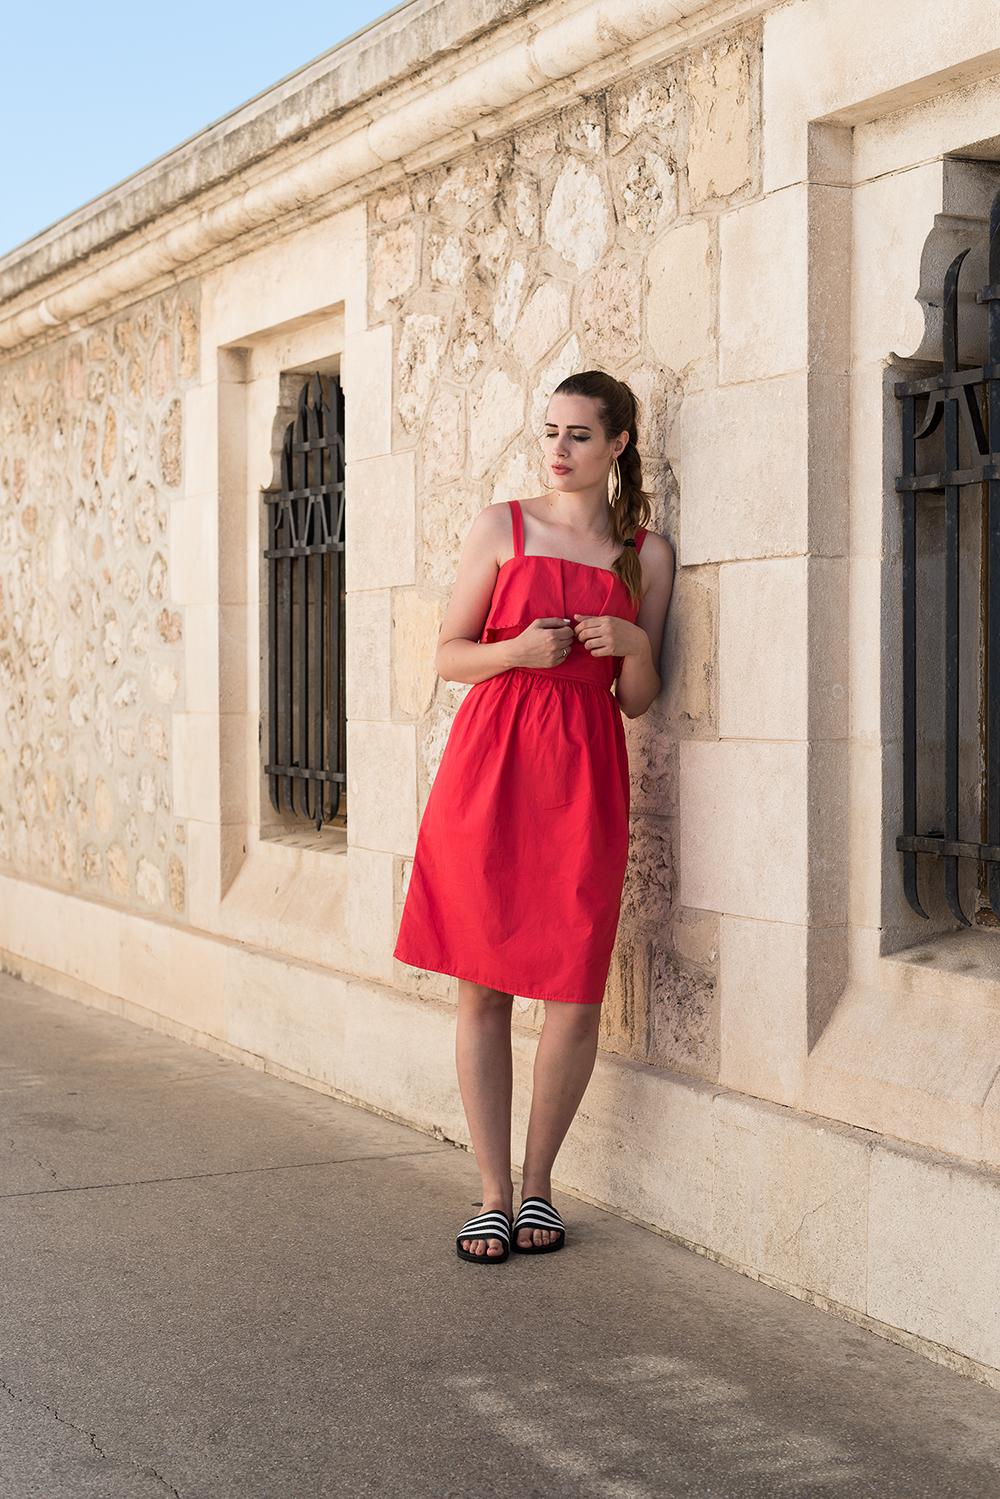 andysparkles-Modeblog Berlin-Outfit-Adilette-JustFab-rotes Kleid